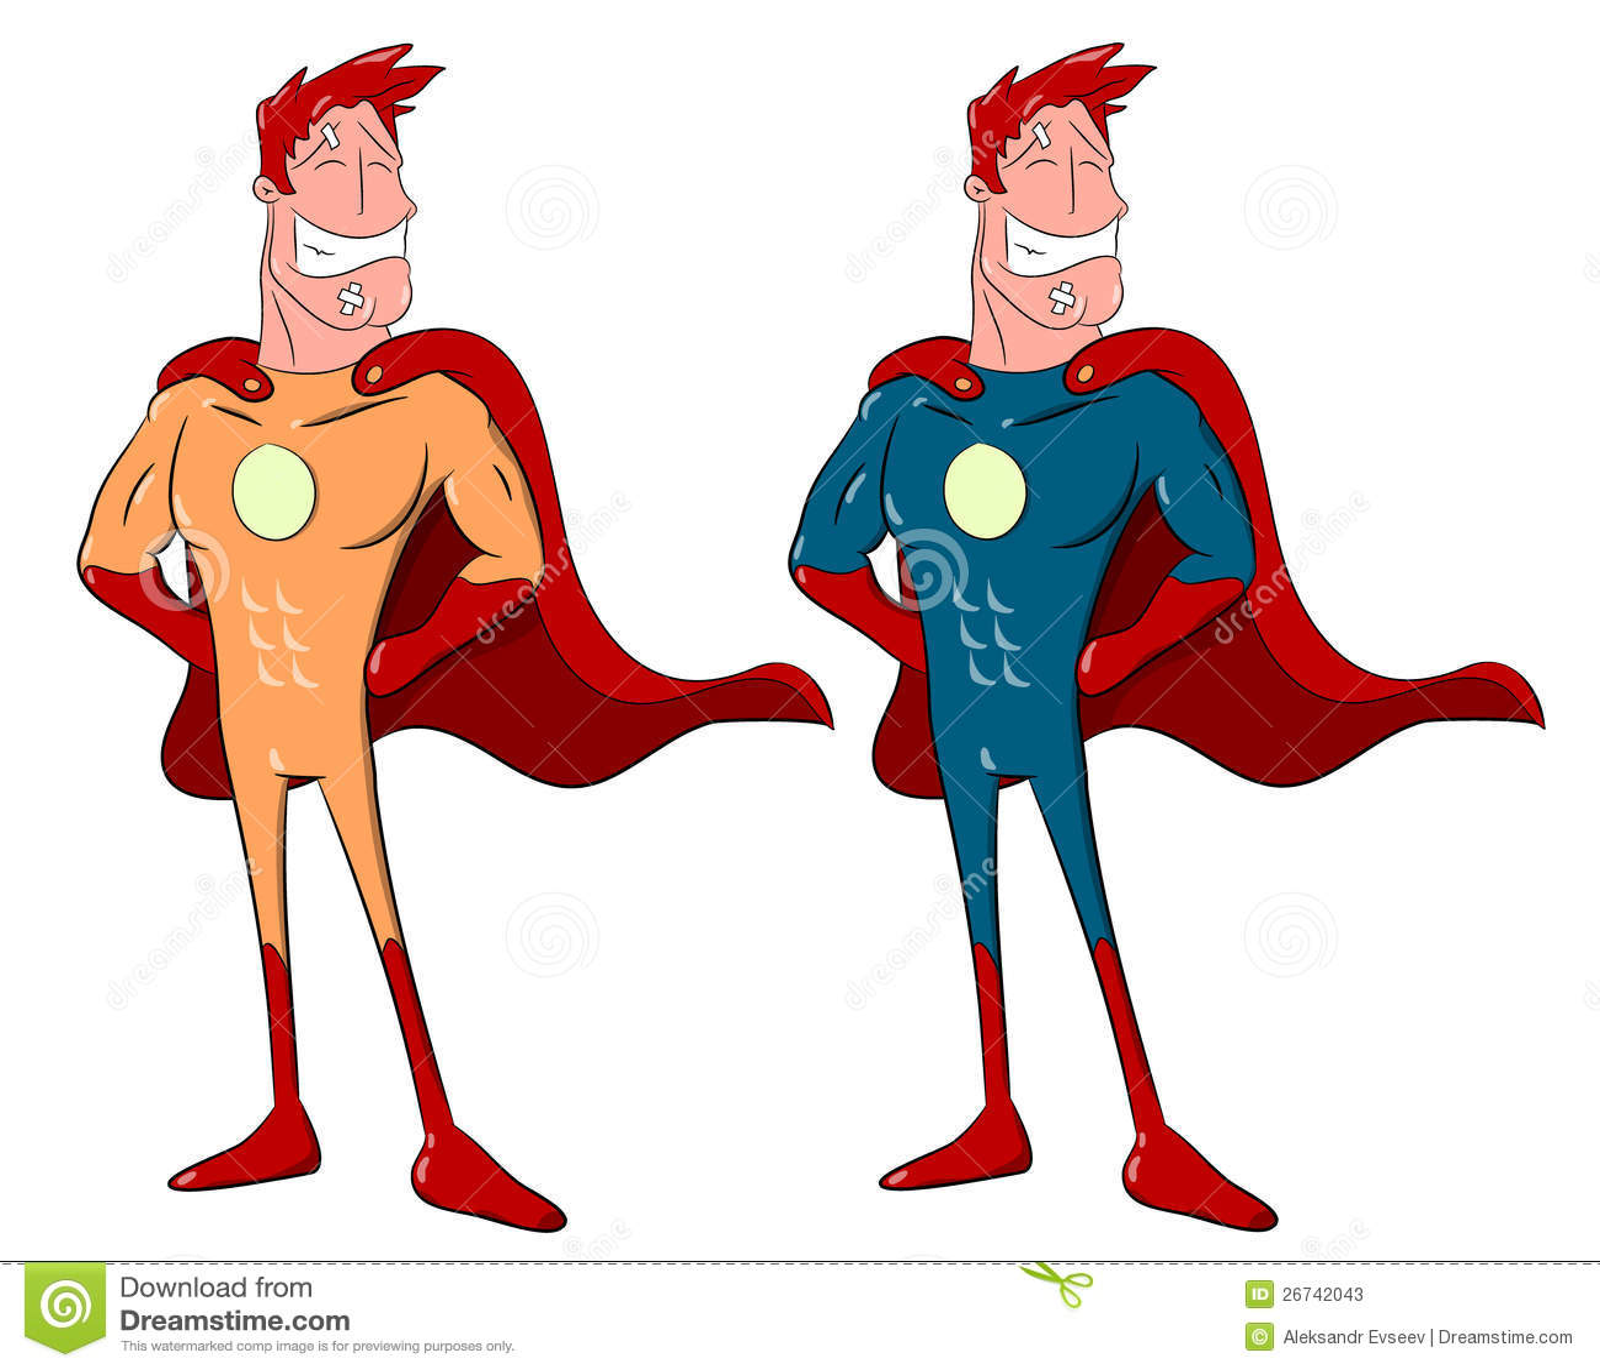 Cartoon Superheroes Stock Photos - Image: 26742043